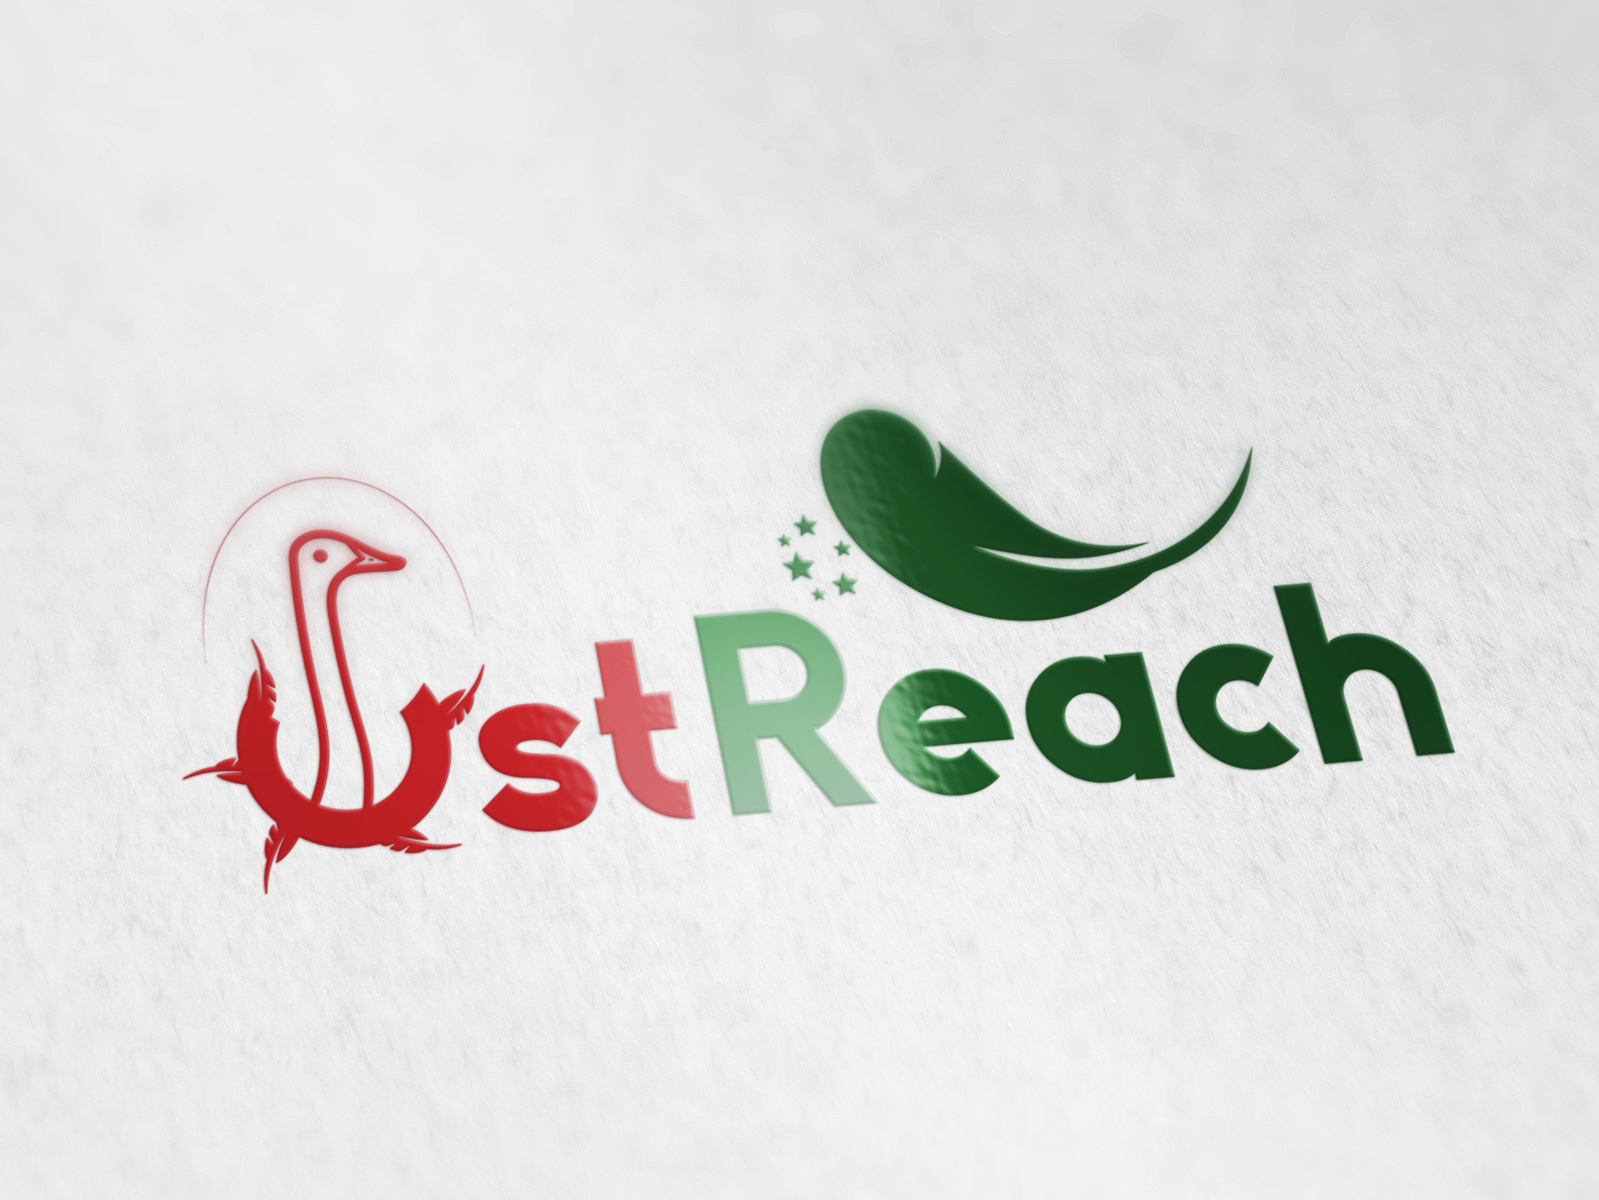 Playful logo design economical logo fun logo re design design branding masculine logo sophisticated logo mature logo logo modern logo design iconic logo simple logo vector logo design branding creative logo consulting logo classic logo best logo design best designer playful logo